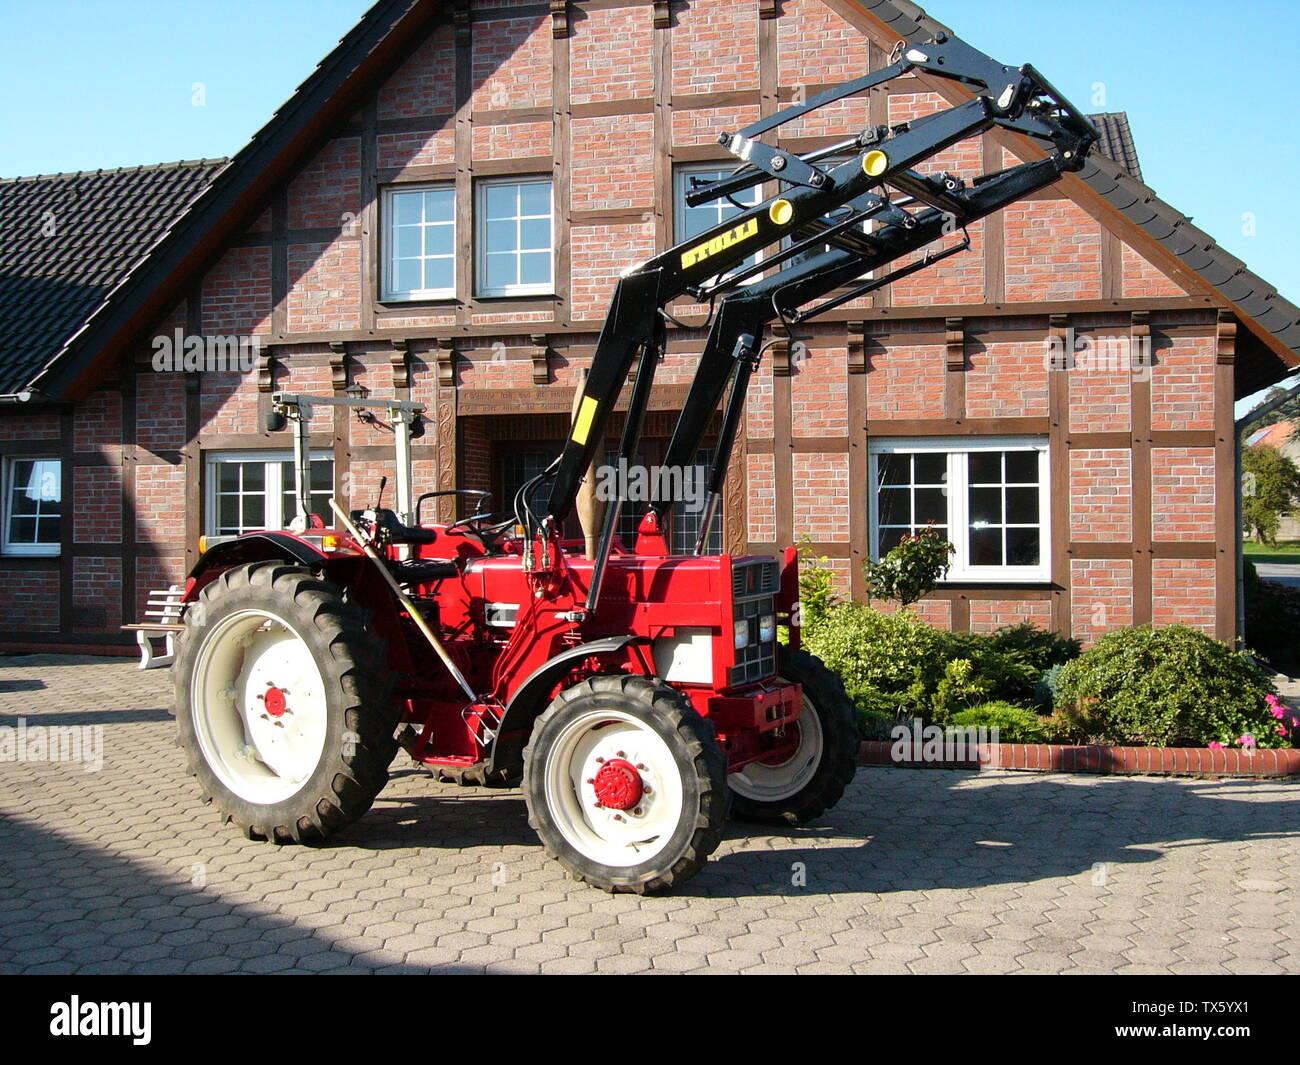 'Deutsch: IHC-Traktor IH 633 AS mit Stoll-Frontlader; 16 September 2007; Own work (844-XLA) English: Transferred from de.wikibooks.org [1]: 2007-09-19 21:45 . . 844-XLA . . 2.304×1.728 (1,56 MB); user 844-XLA; ' - Stock Image